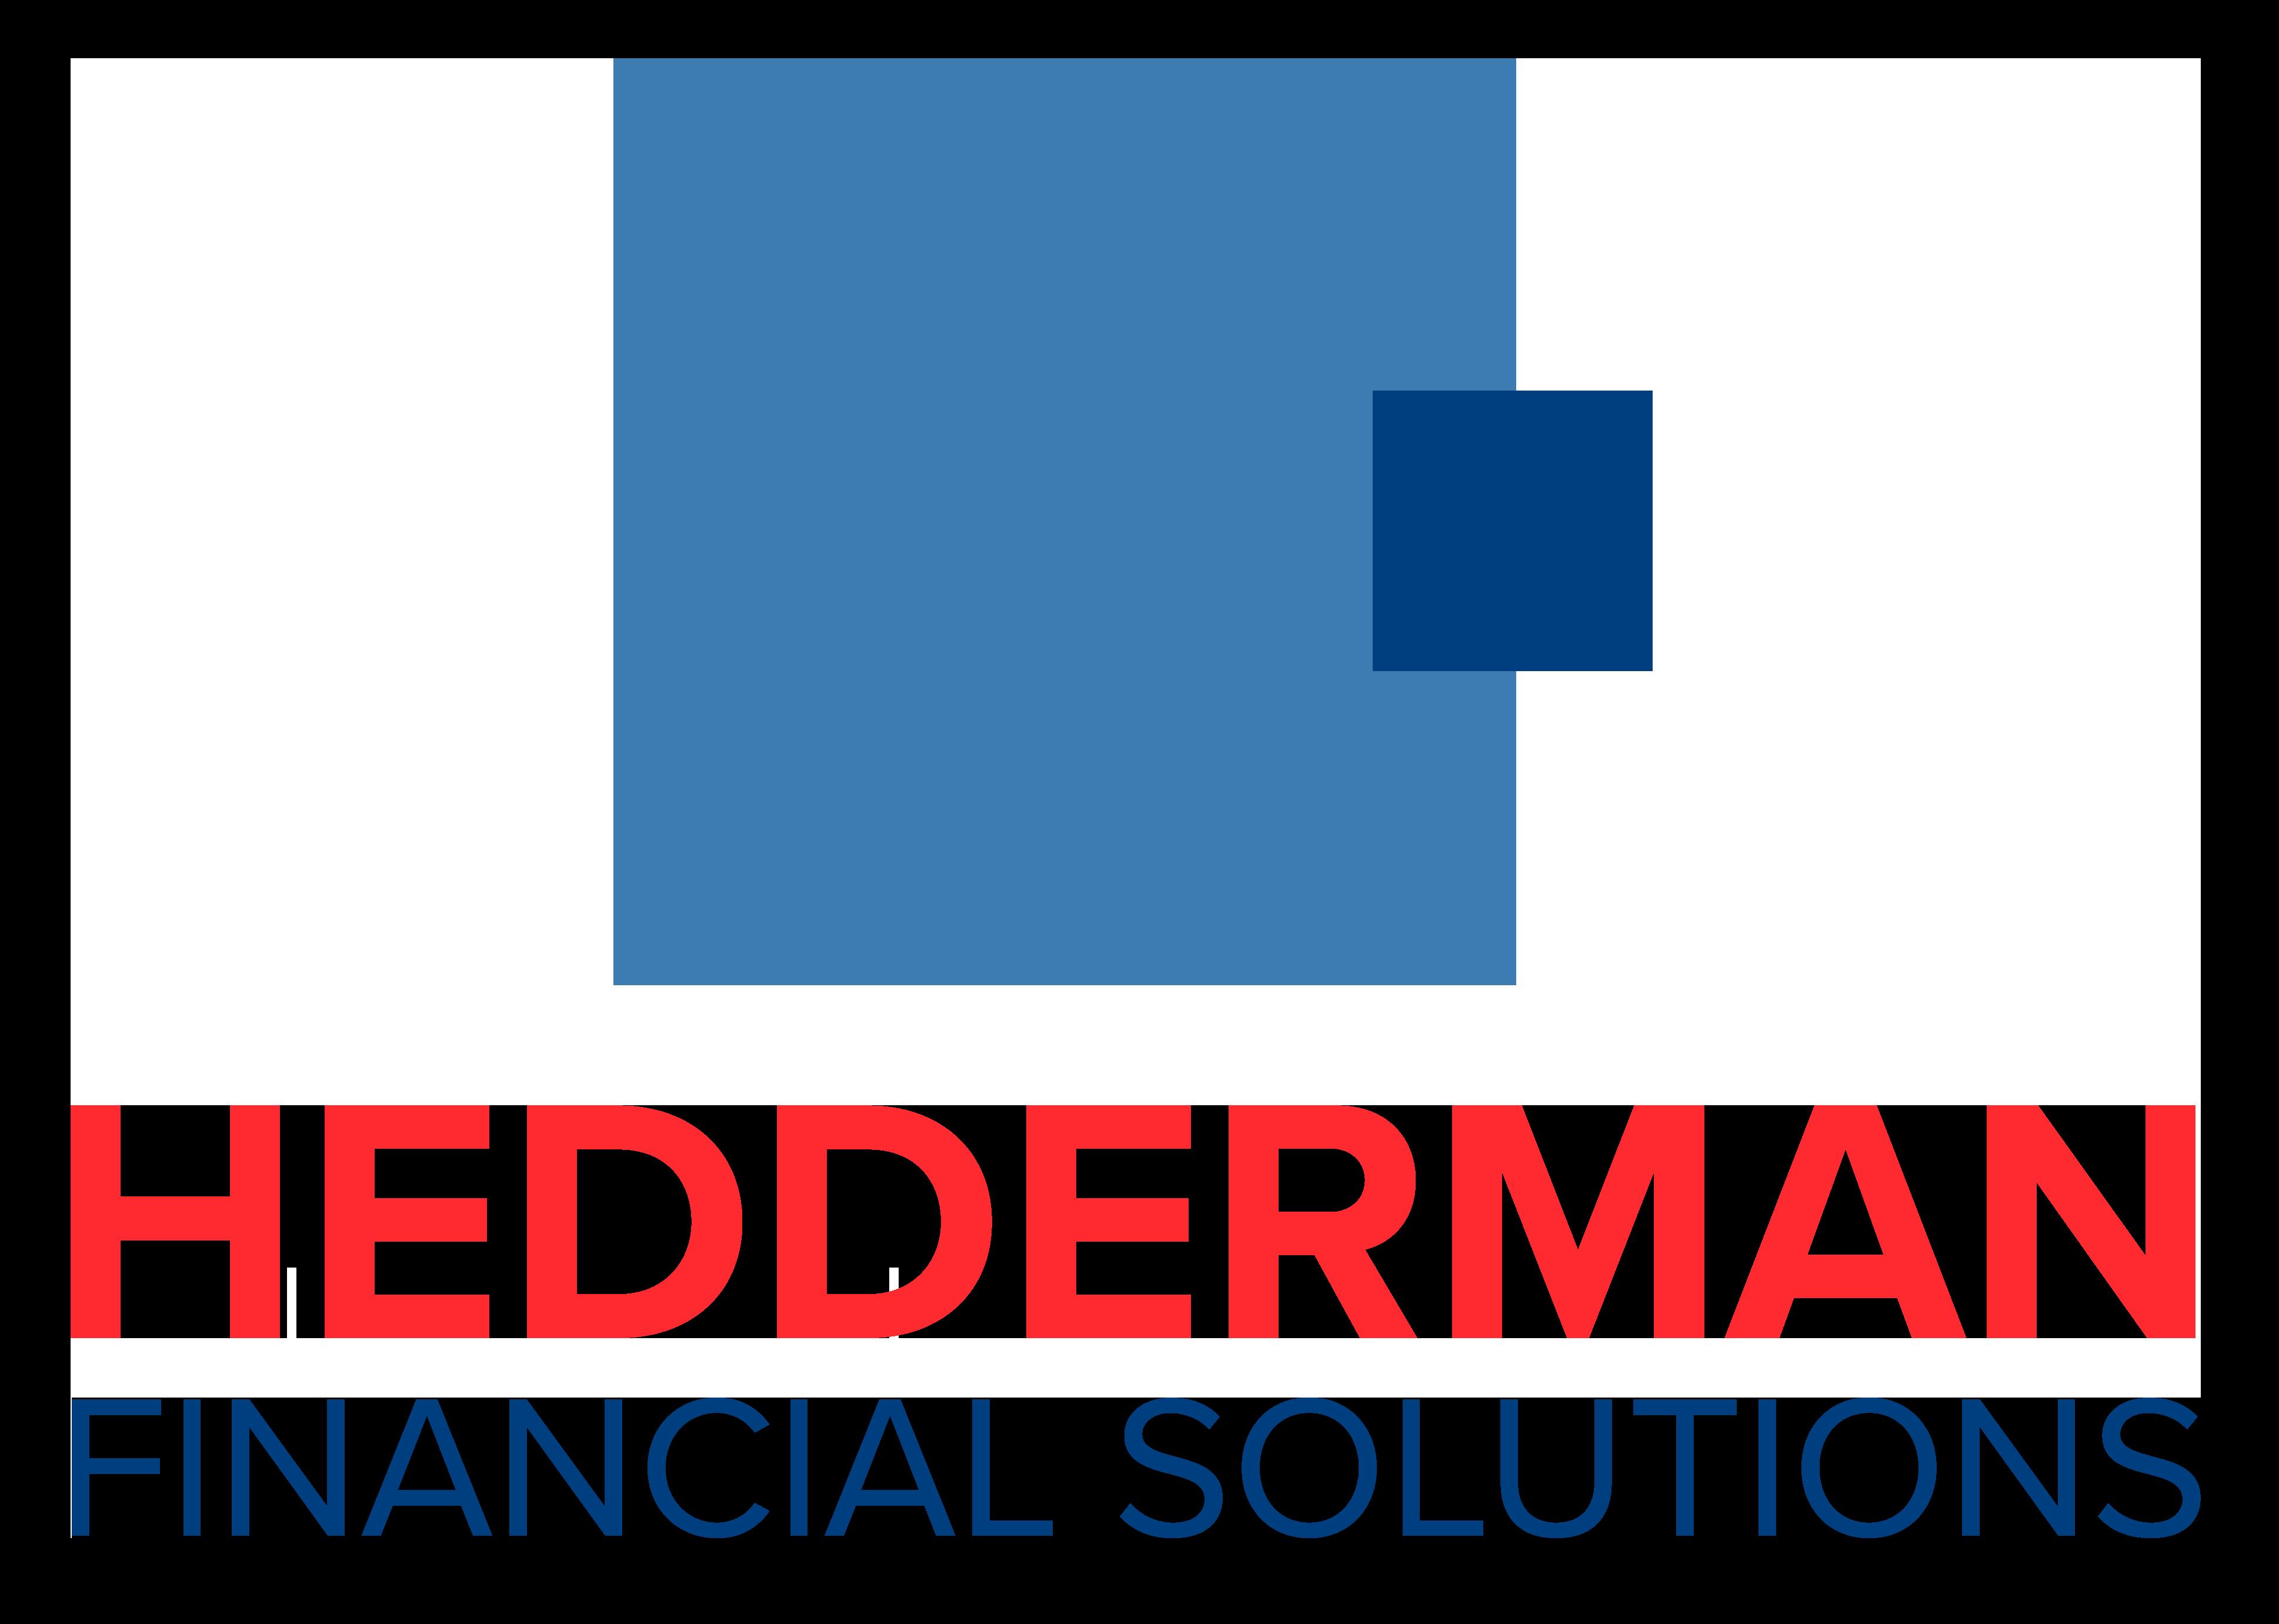 Hedderman Financial